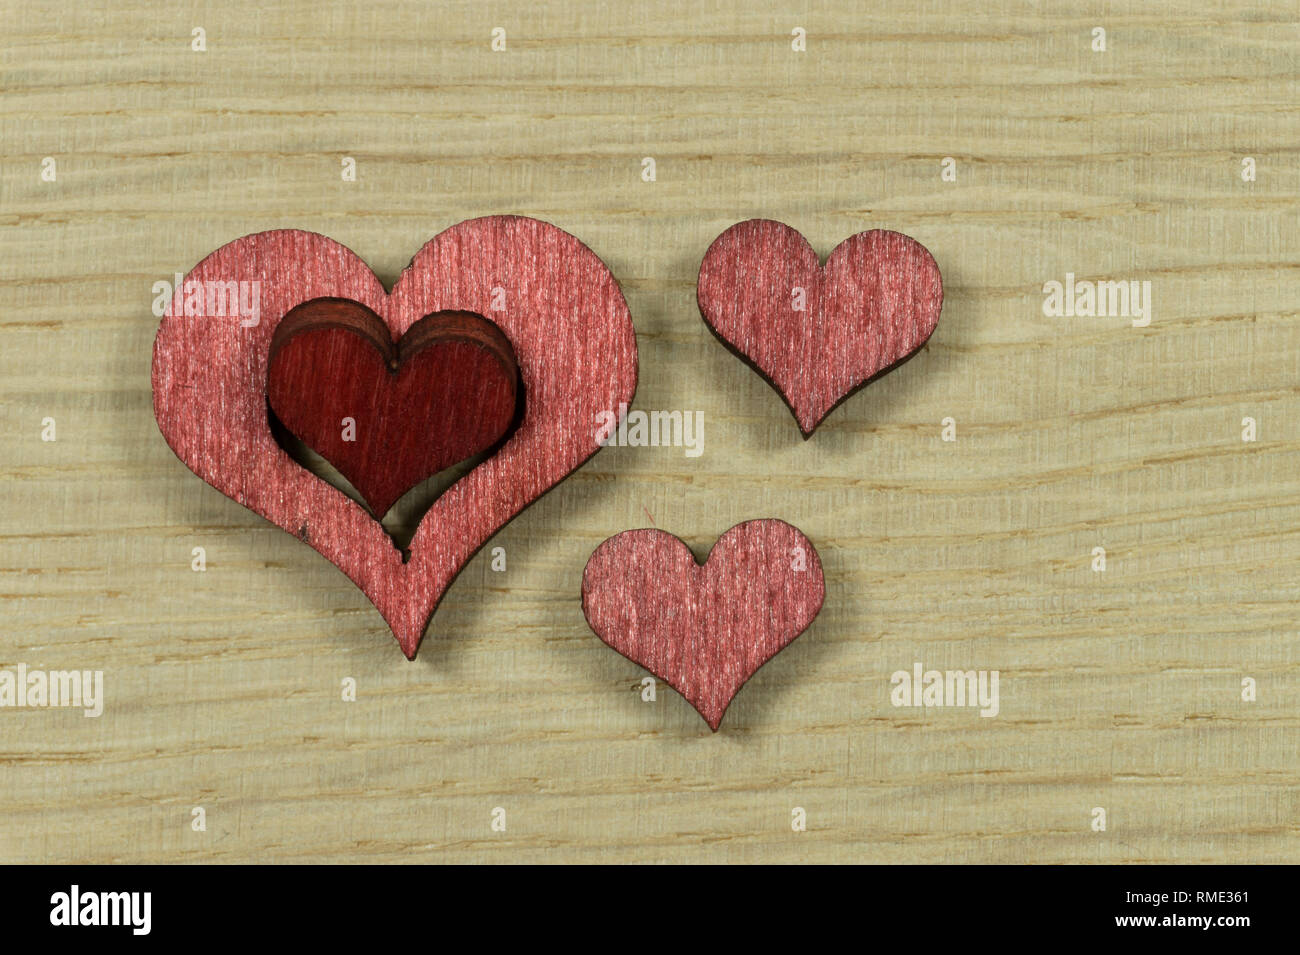 bilder romantik kostenlos